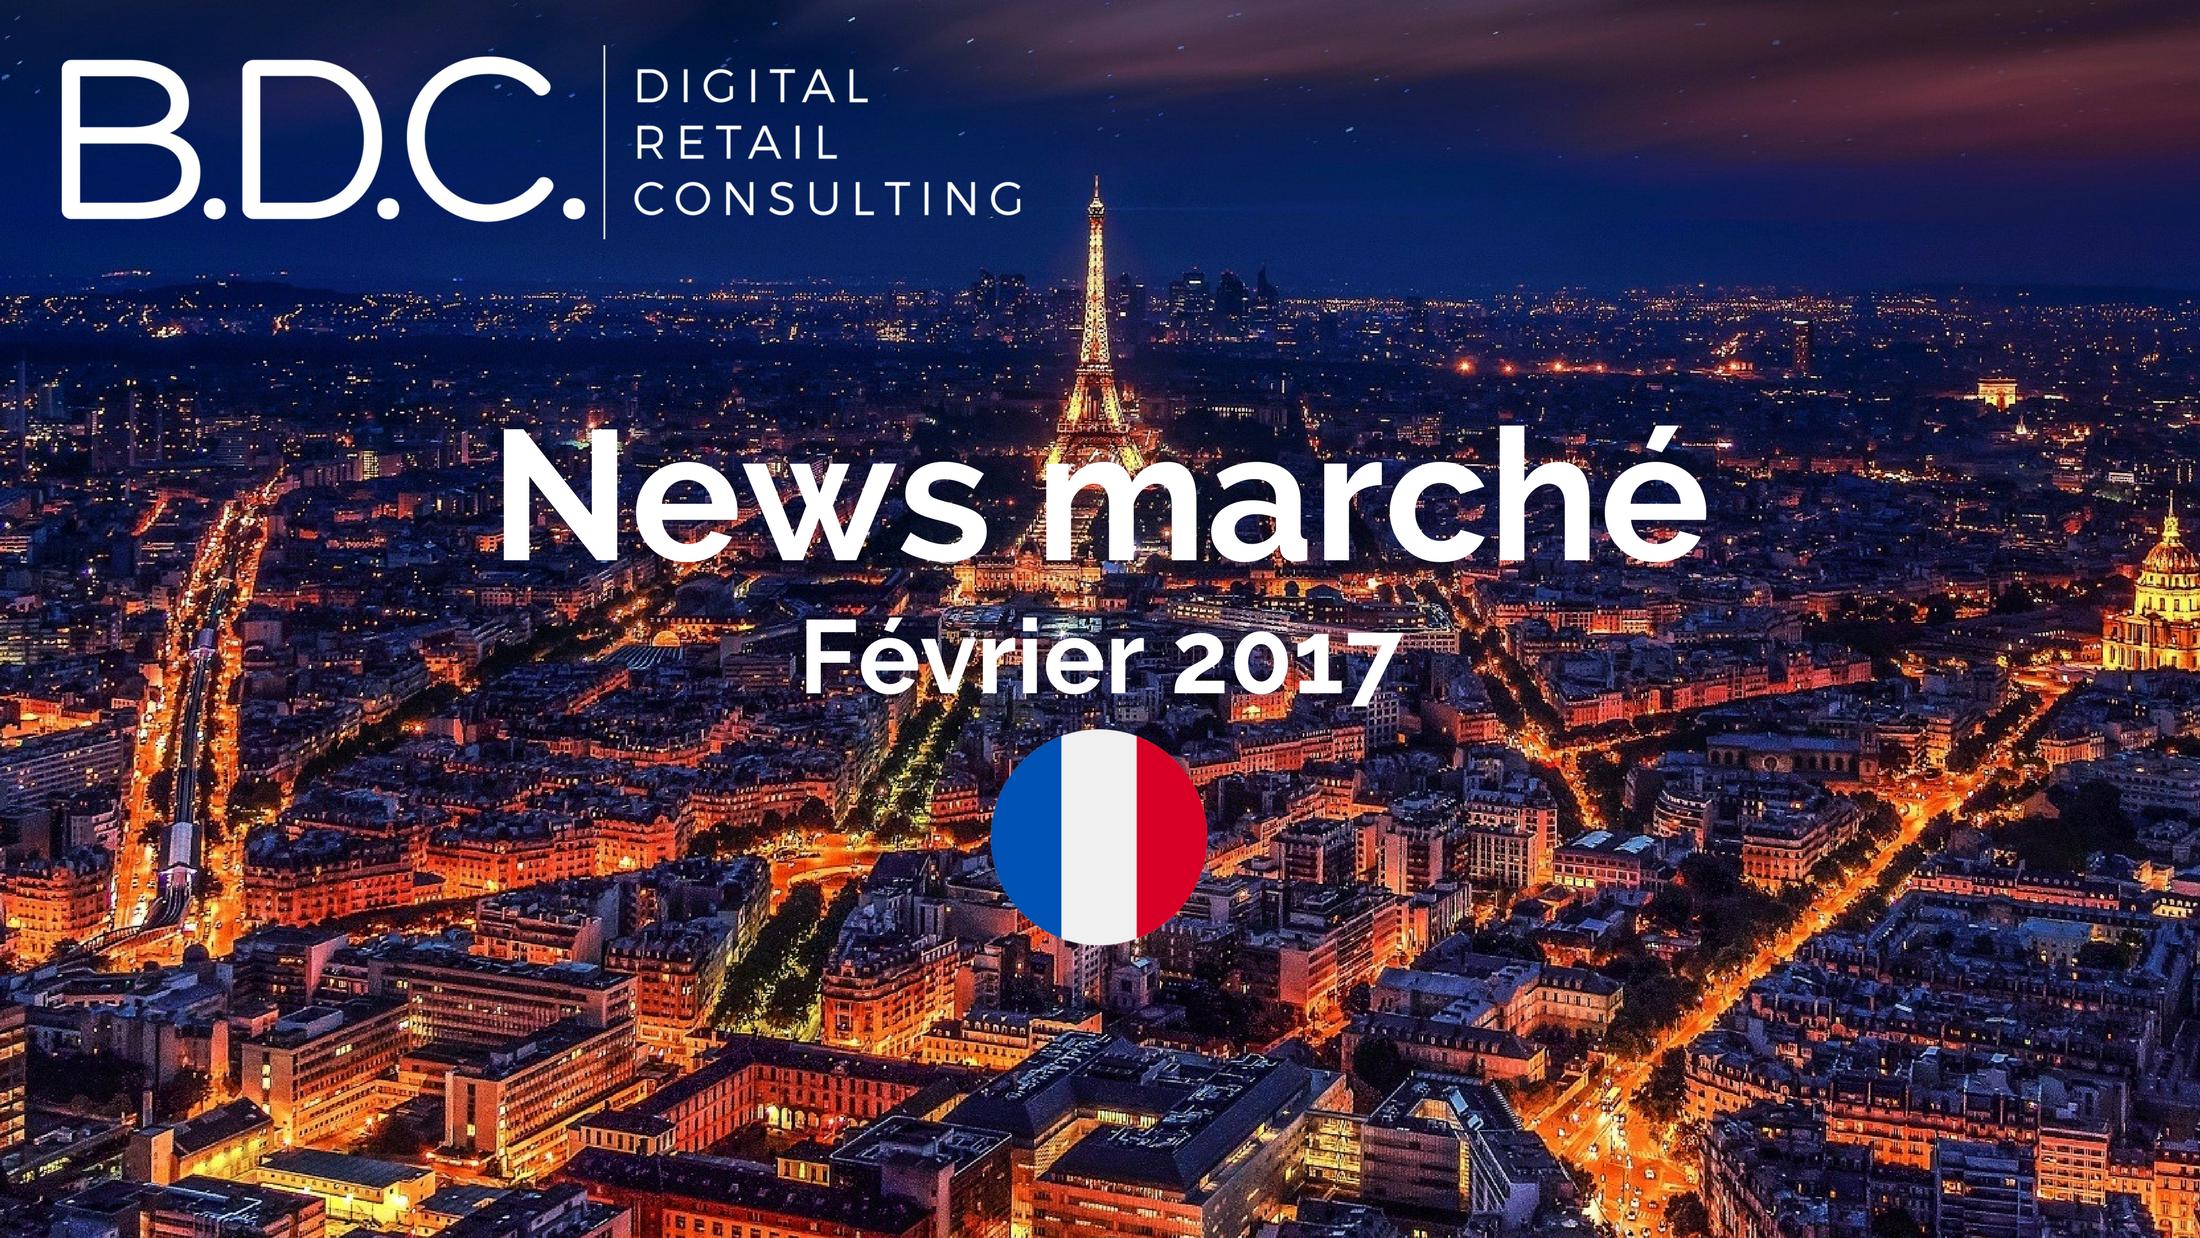 Trends News 2 - News marché - Février 2017